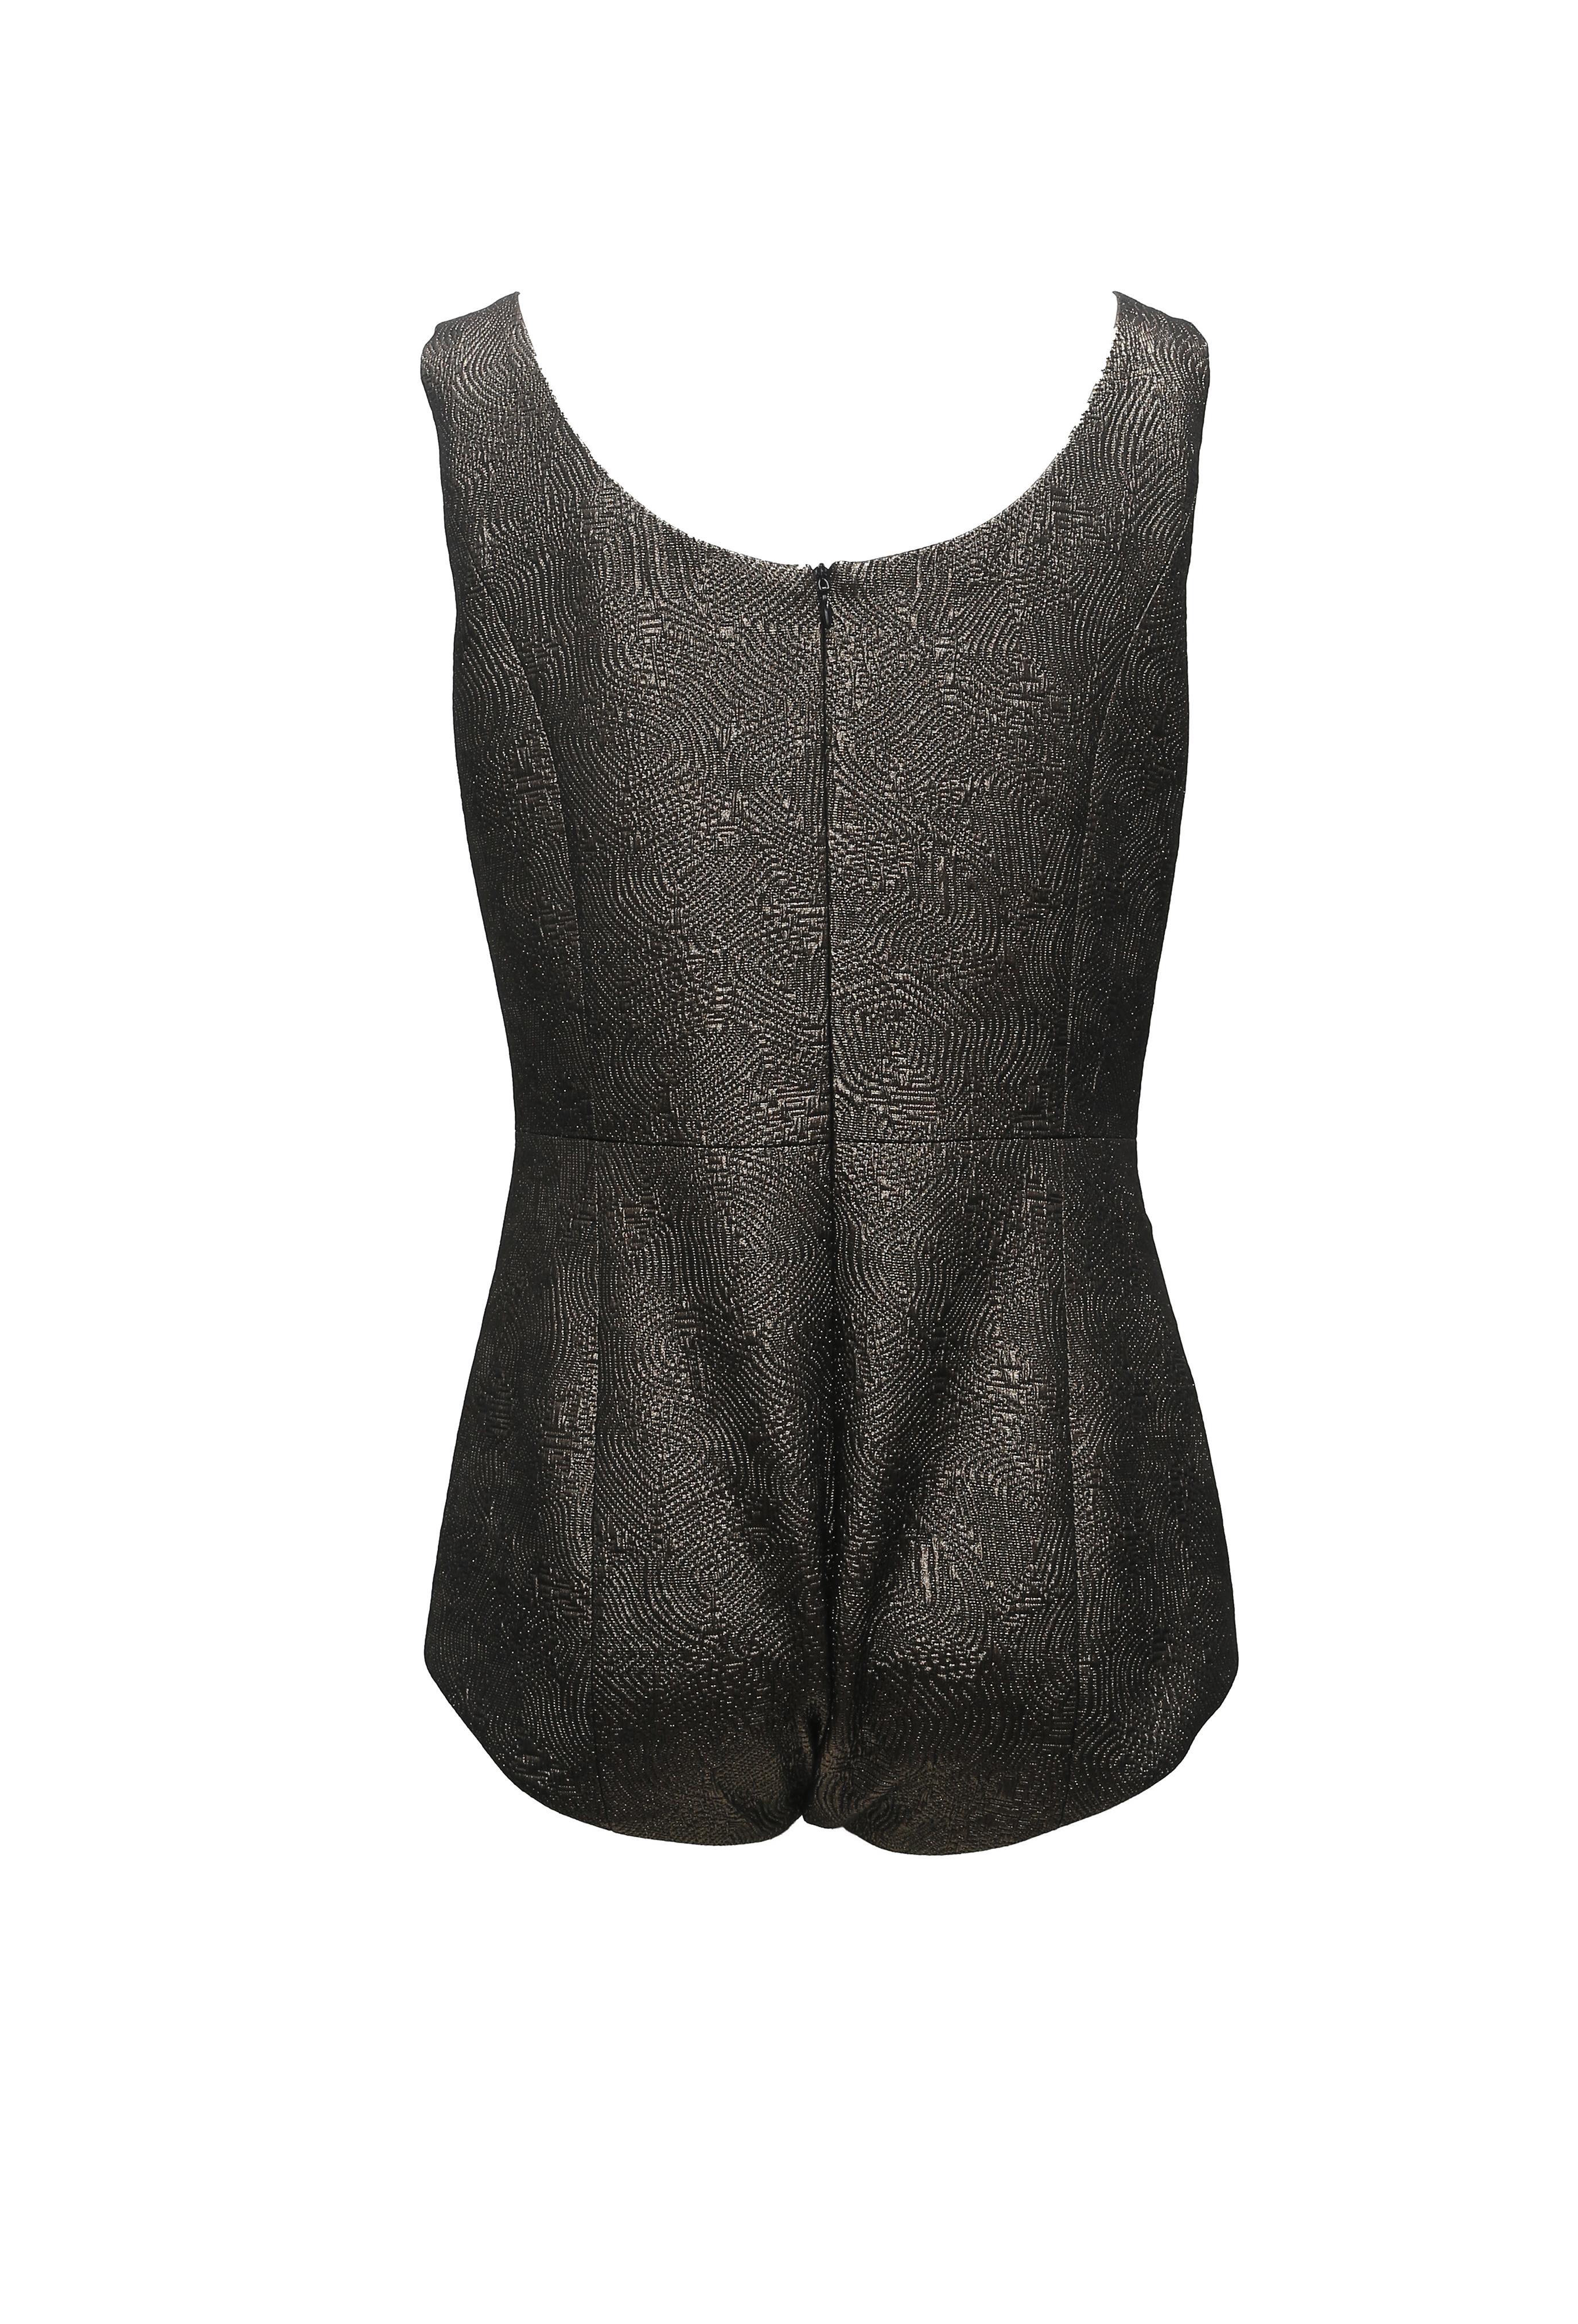 Jacquard Sleeveless Bodysuit